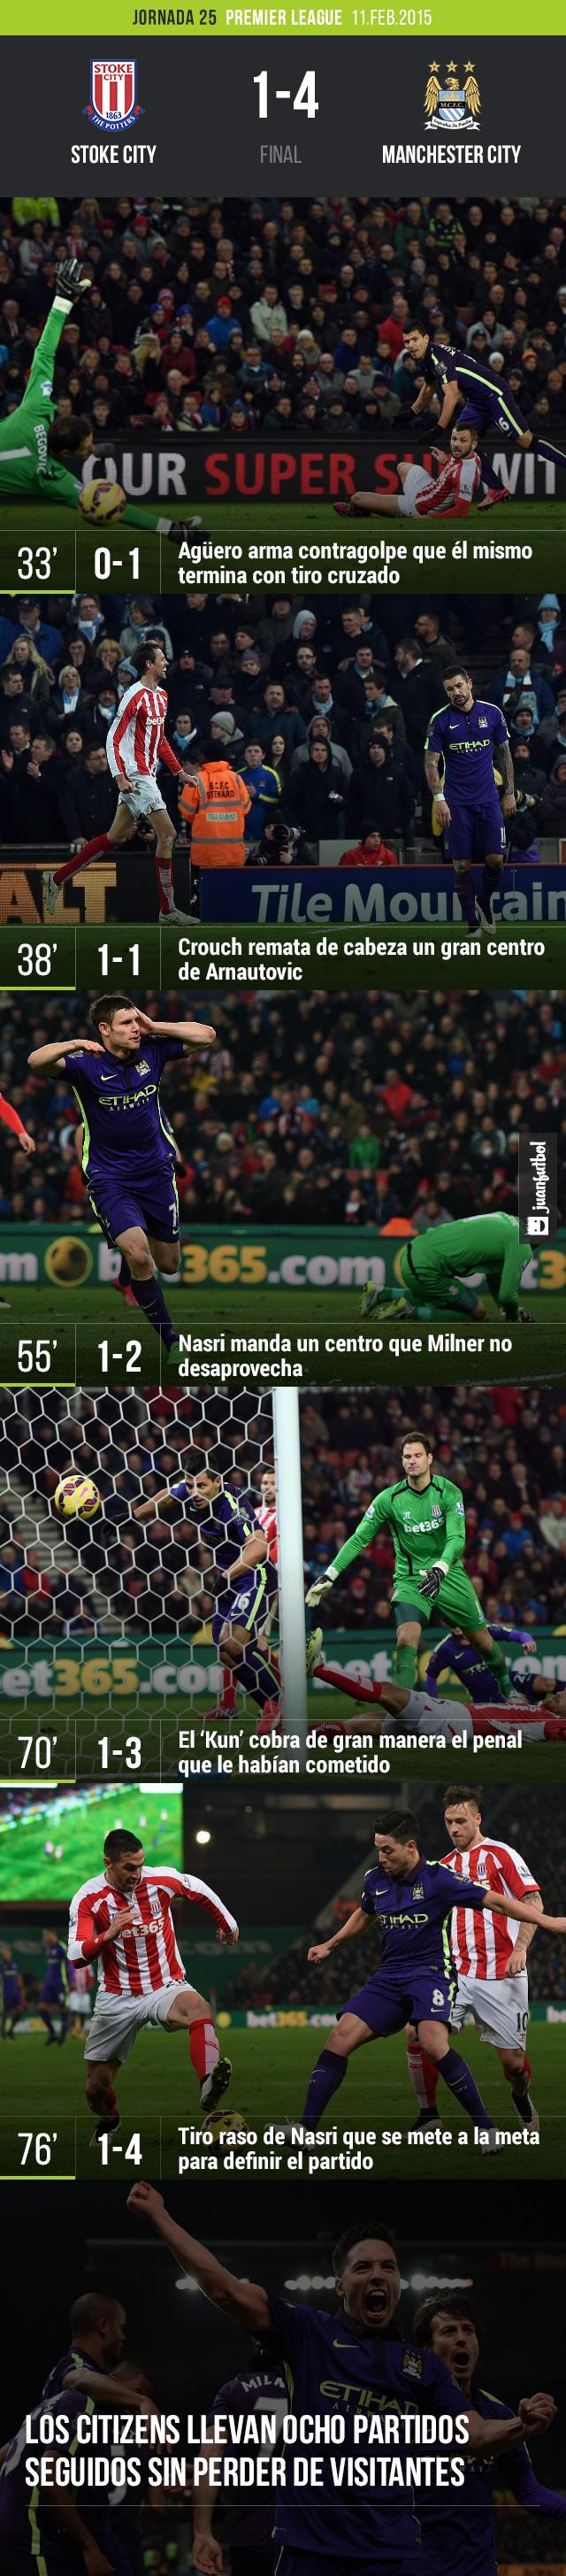 Manchester City derrotó 4-1 a Stoke con dos goles del 'Kun' Agüero